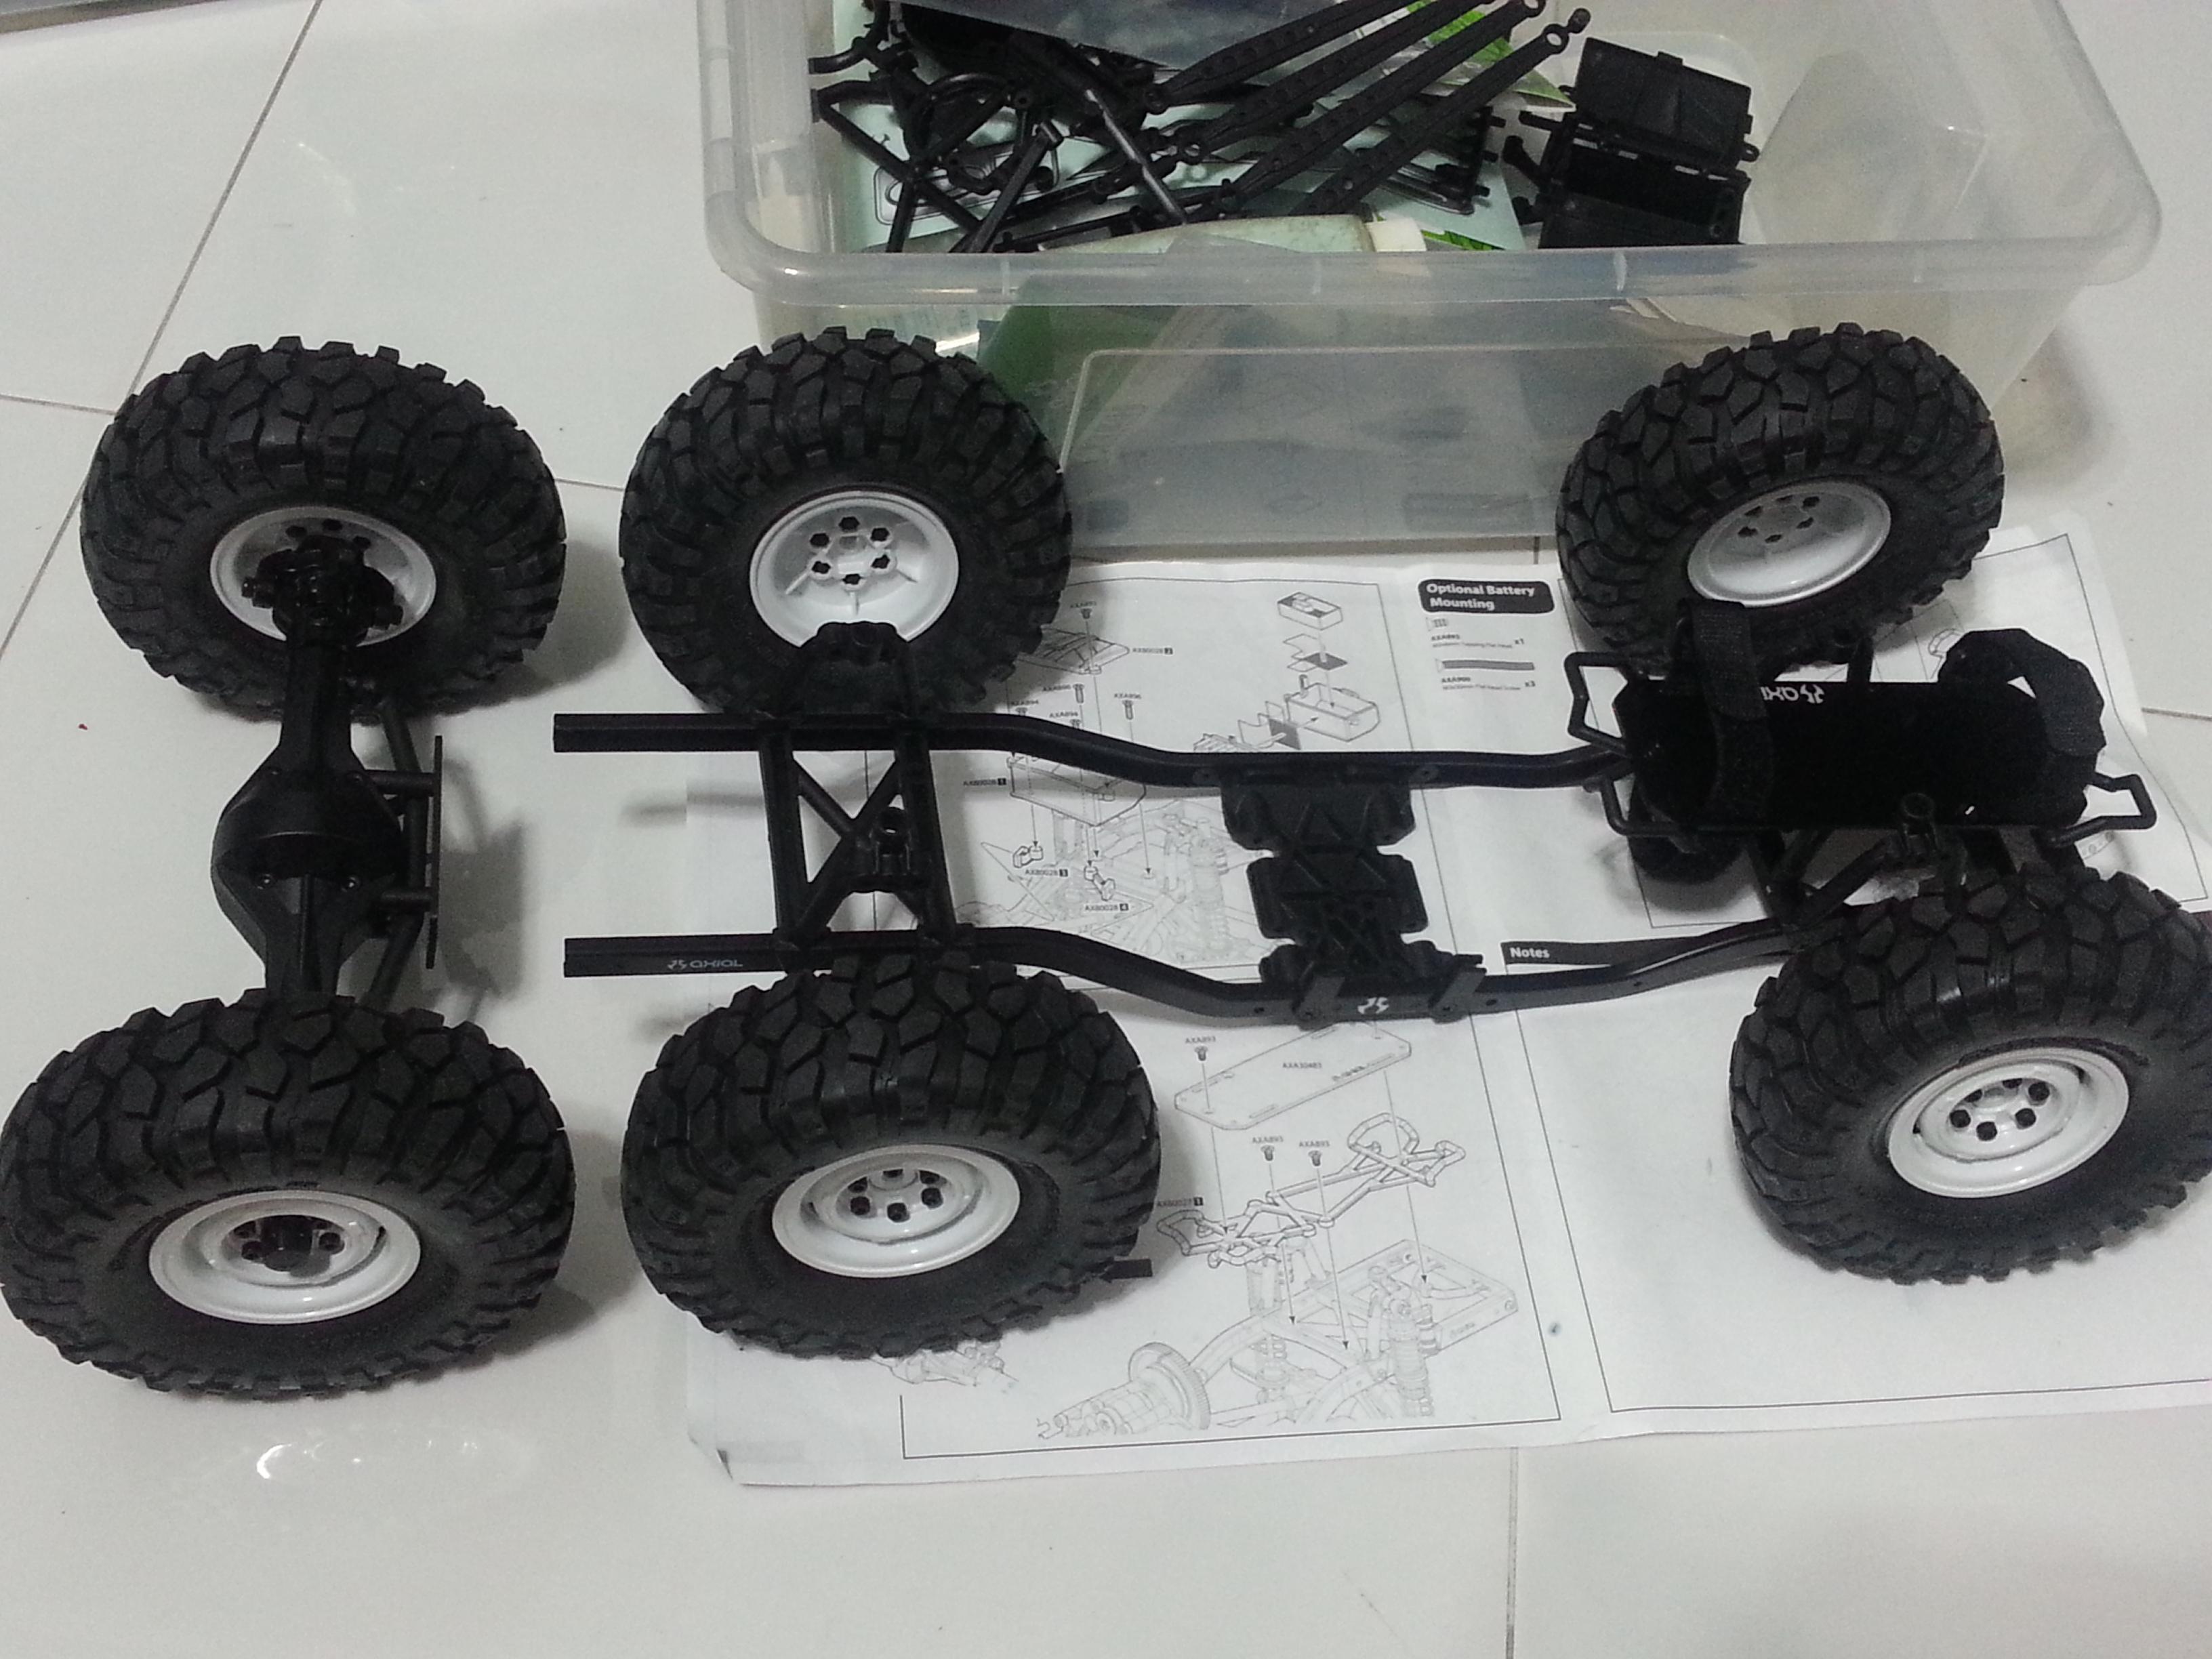 build - Babyboy's first 6x6 build 15154861113_03f1d6eca0_o